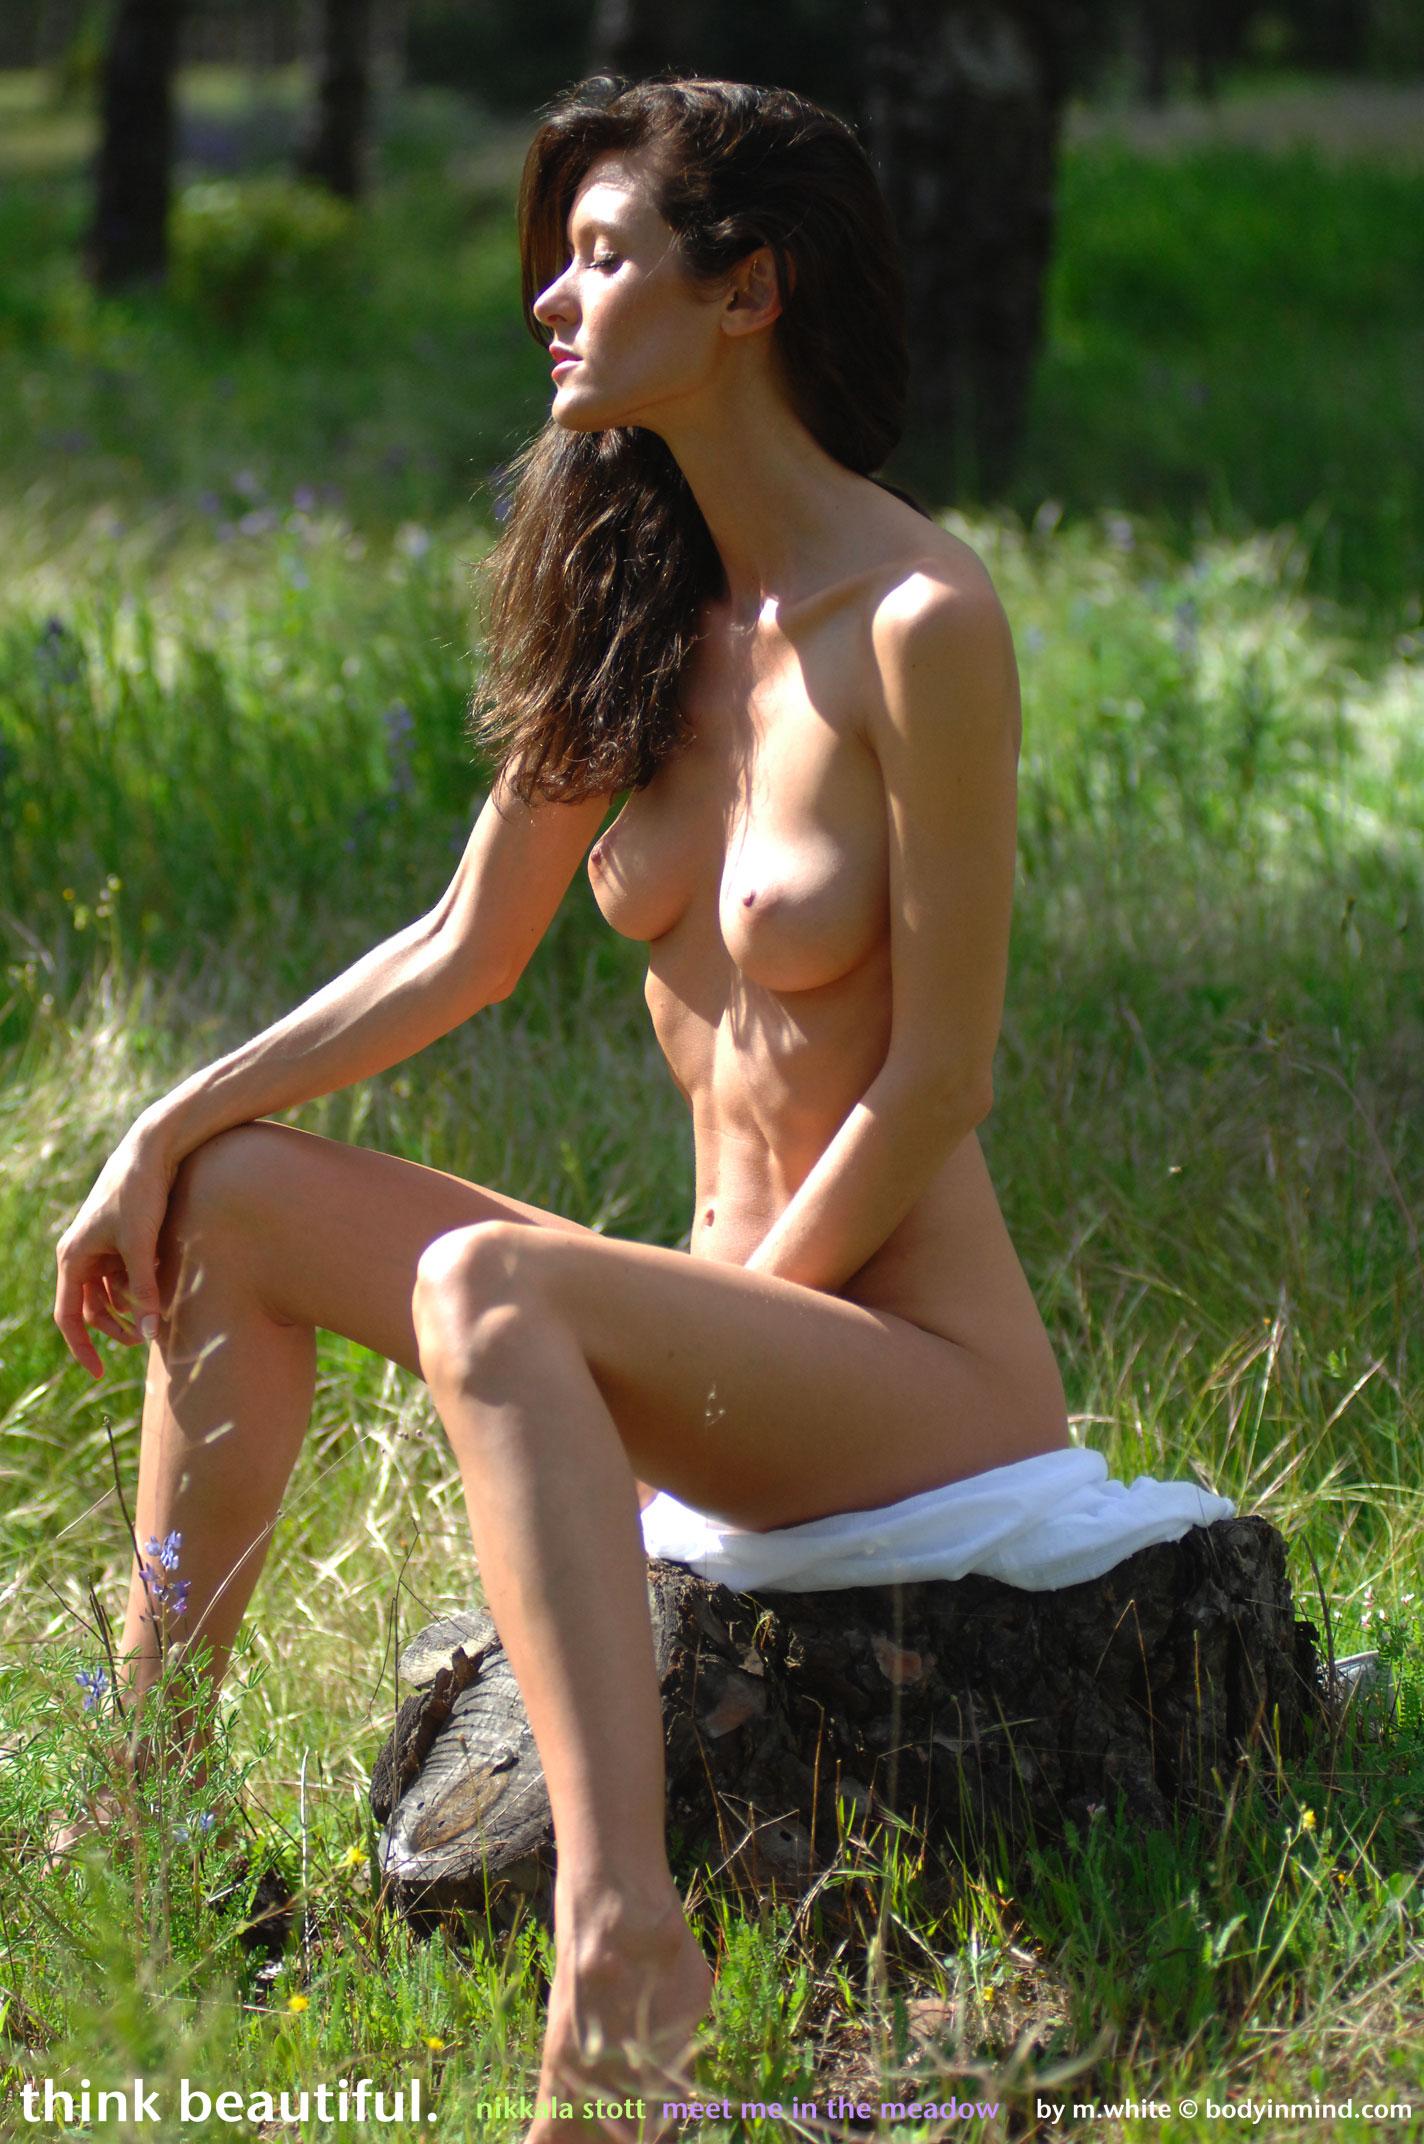 Nikkala Stott in Meadow - NudesPuri.com